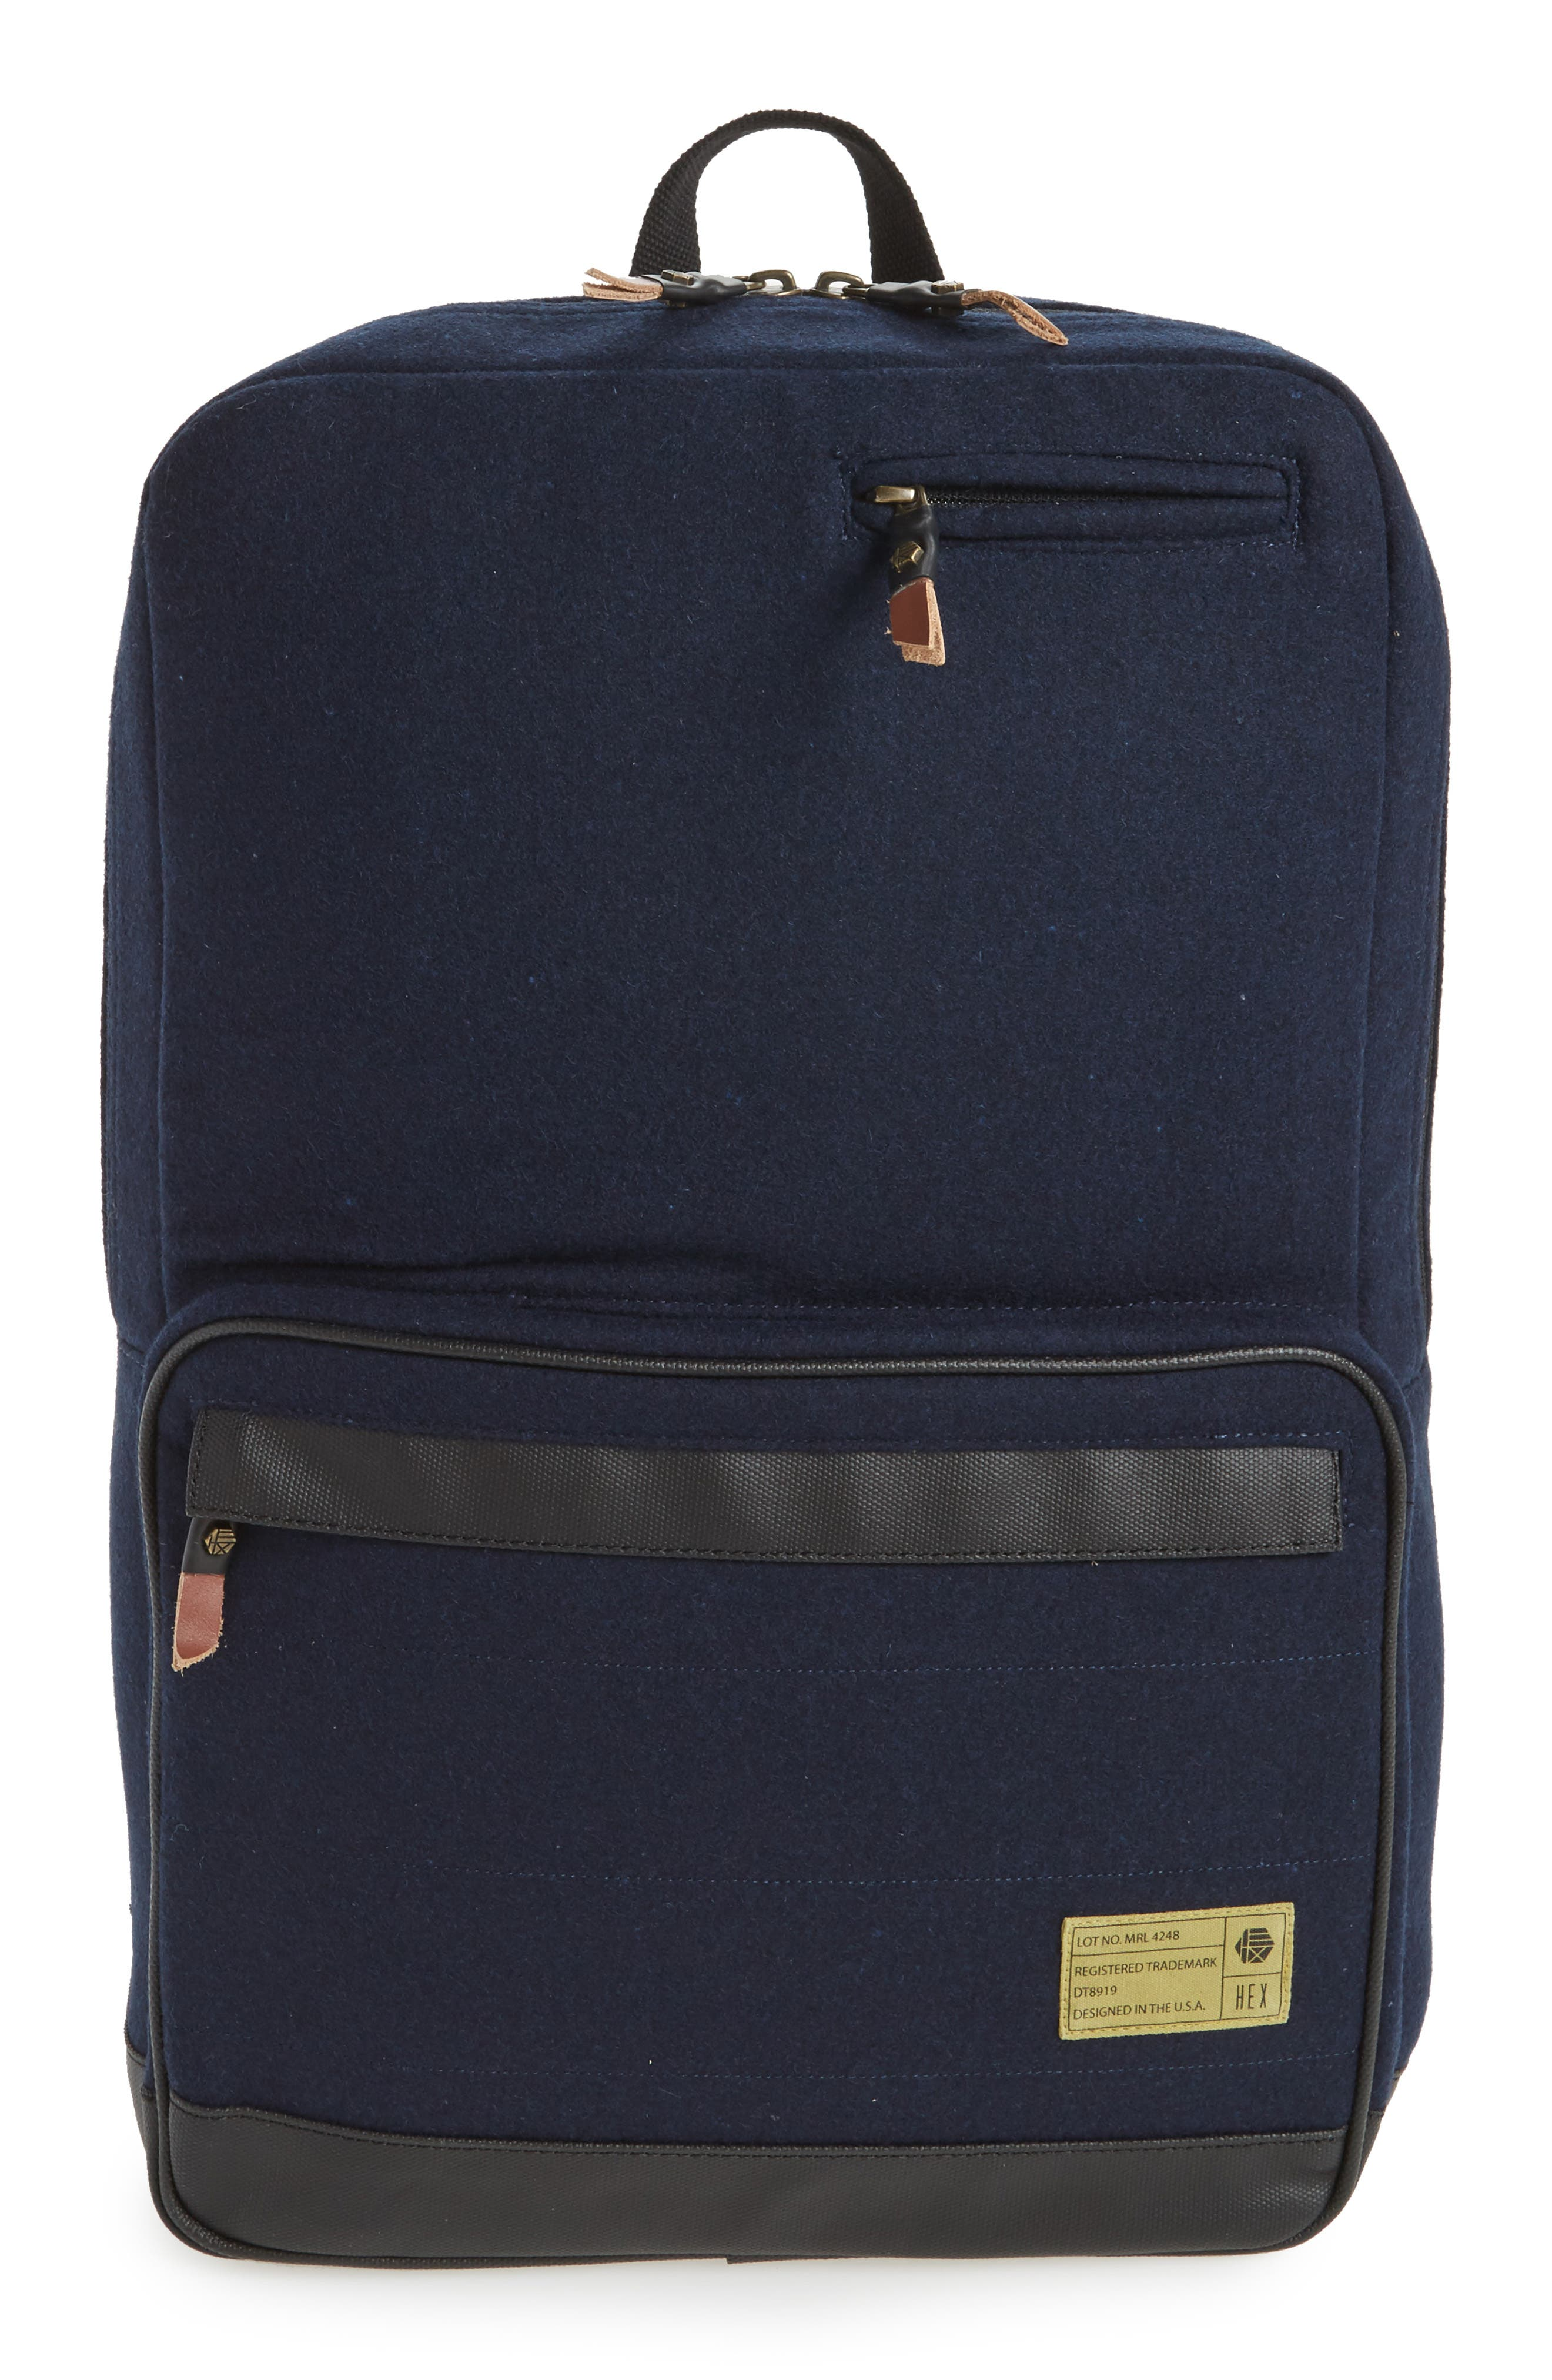 HEX Radar Origin Water Resistant Commuter/Travel Laptop Backpack